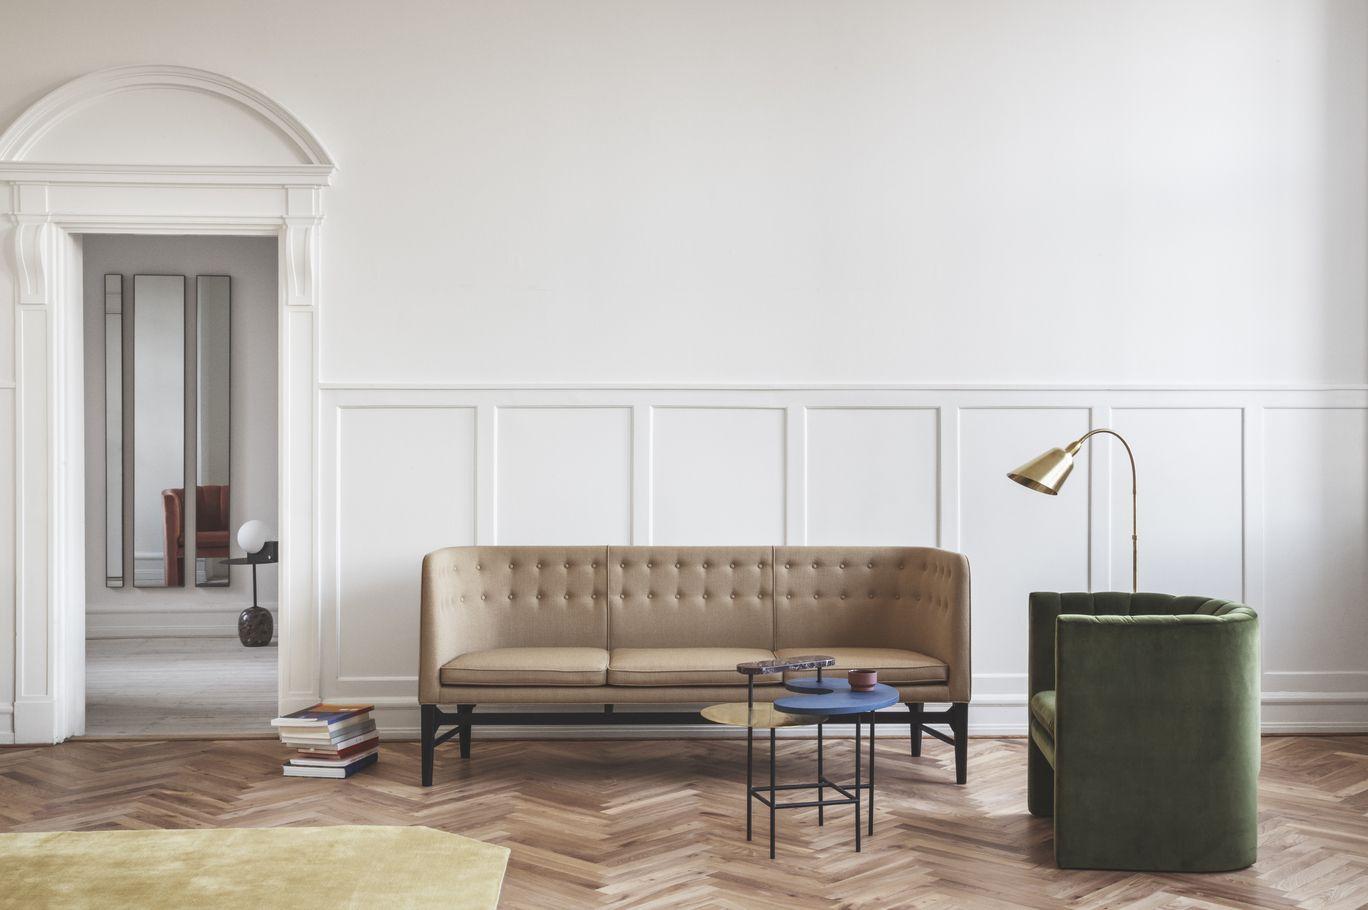 Mayor Sofa By Arne Jacobsen Bellevue Lamp By Arne Jacobsen Palette Table By Jaime Hayon Contemporary Furniture Design Contemporary Furniture Interior Design